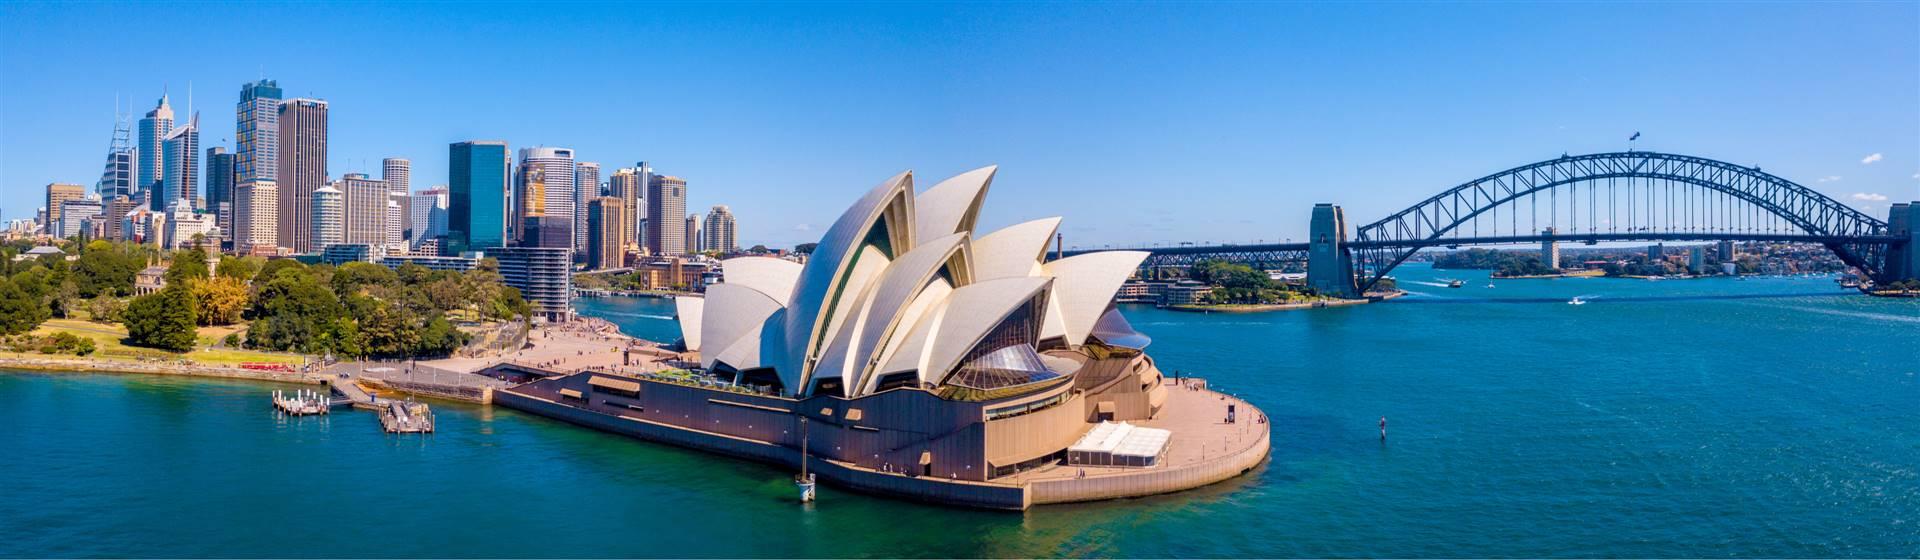 "<img src=""sydney-shutterstock_741014362.jpeg"" alt=Sydney Harbour""/>"